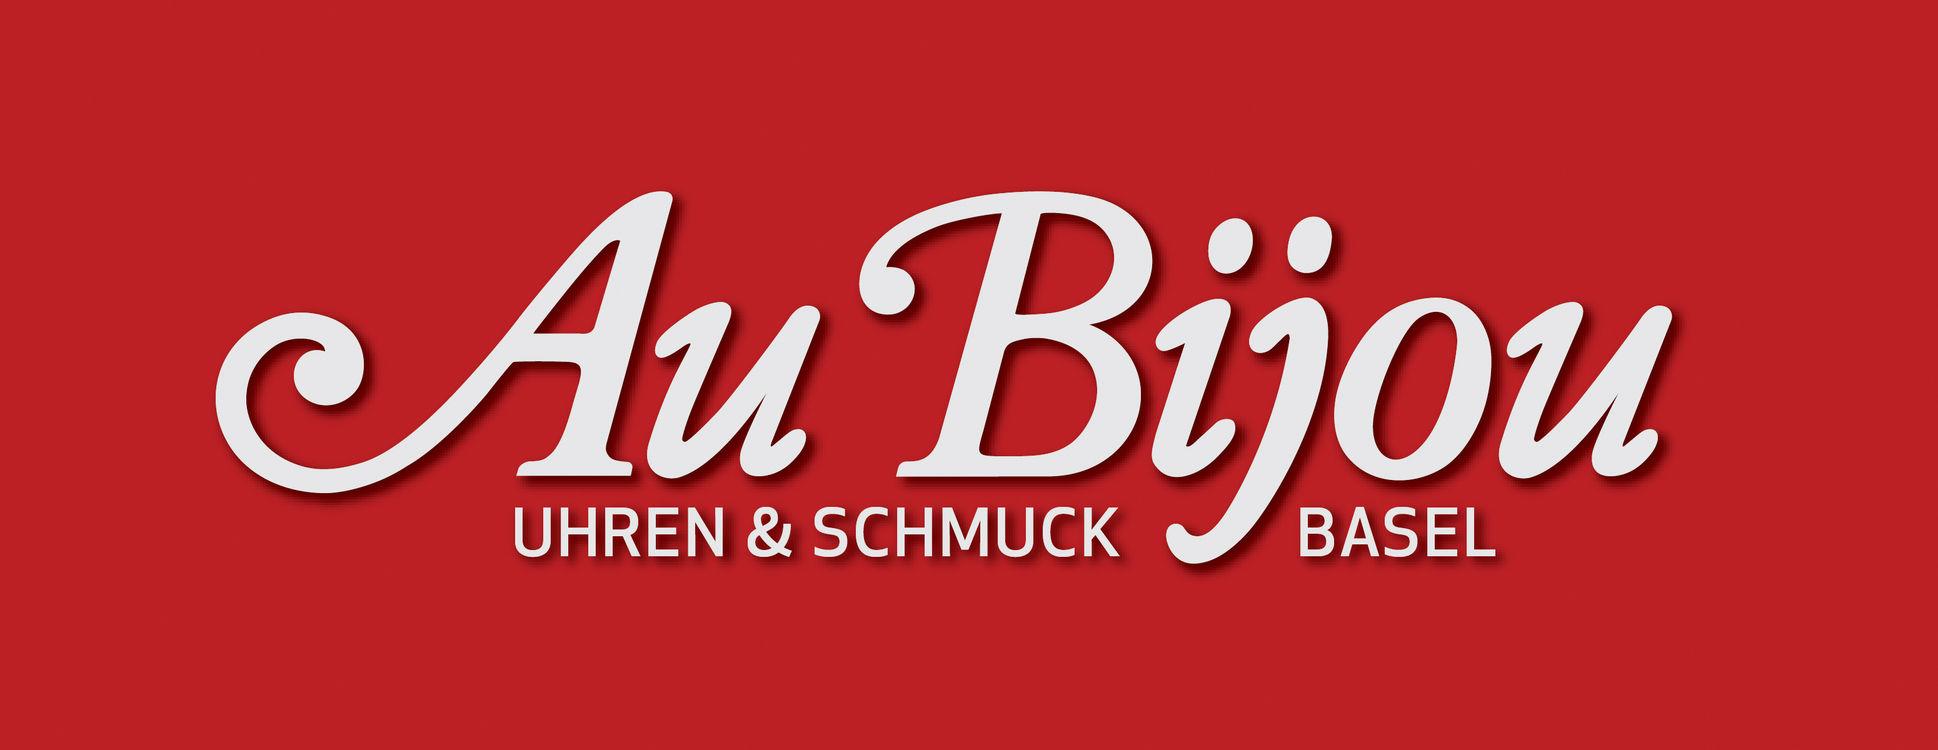 Au Bijou Uhren & Schmuck à Bâle (Bild 2)